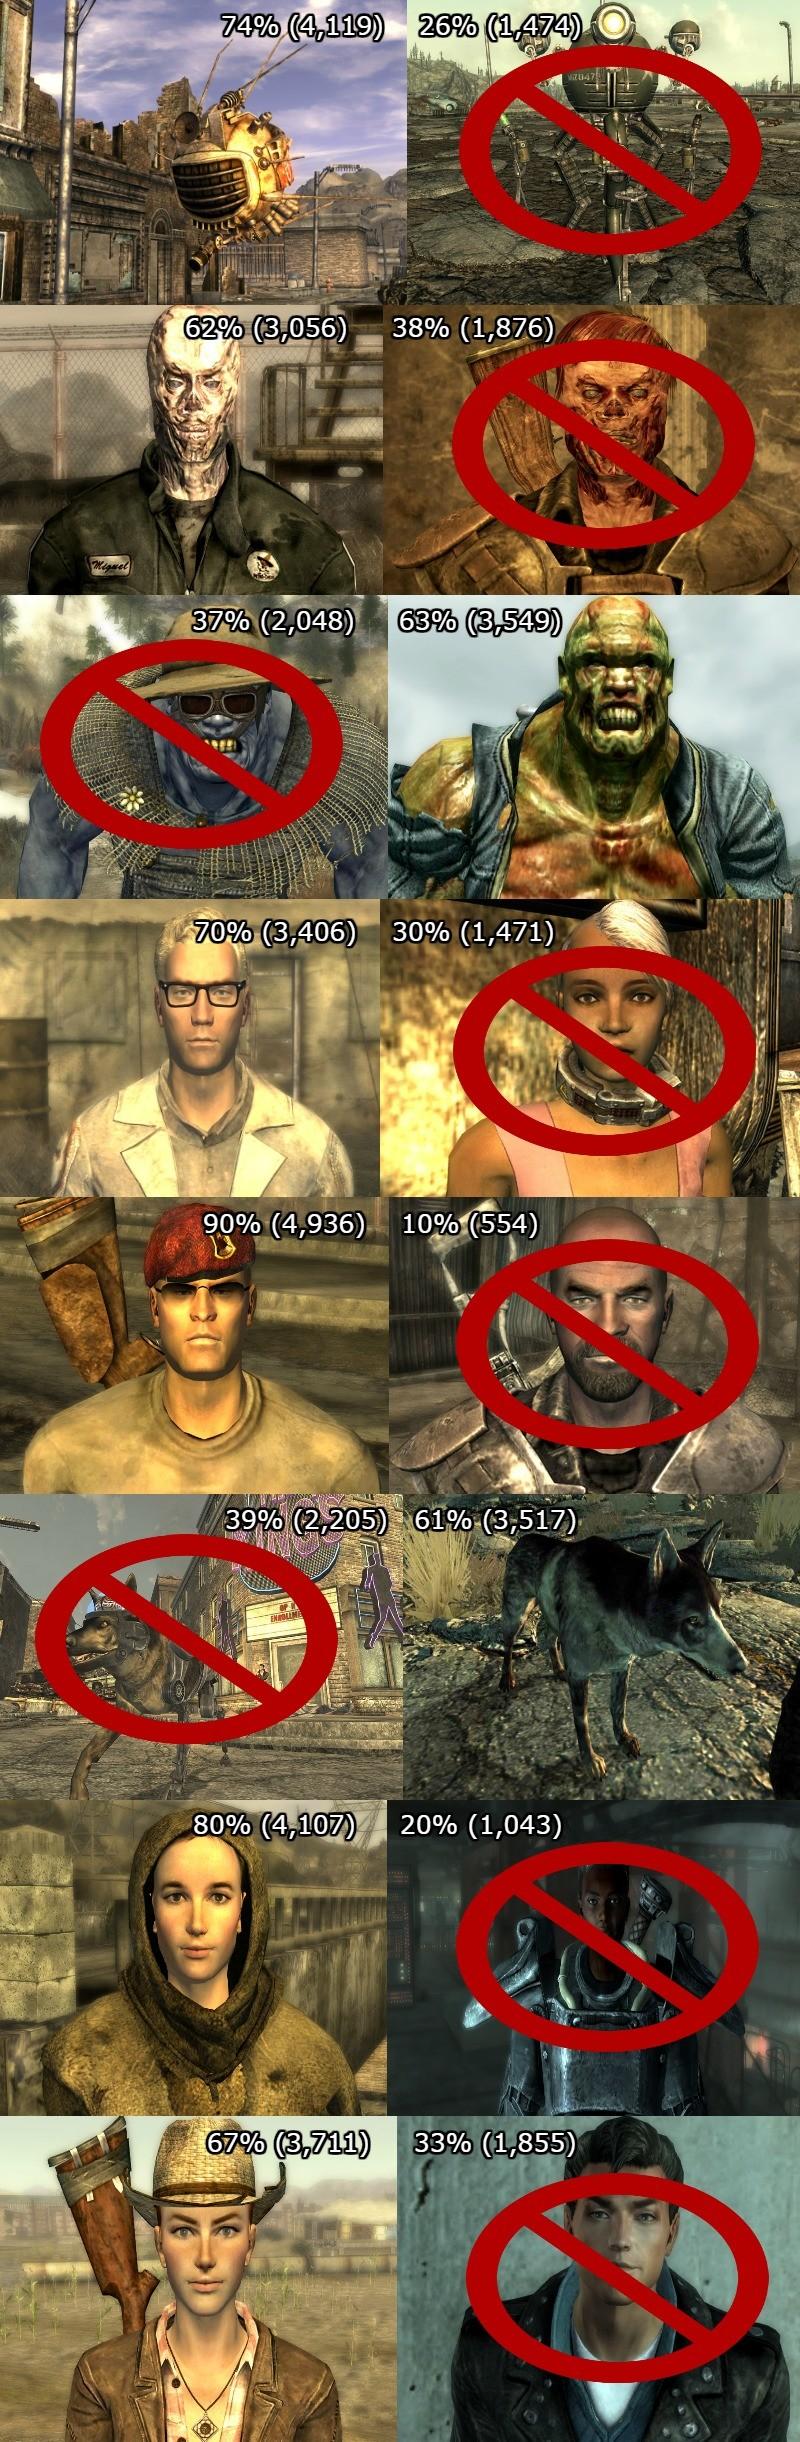 Fallout 3 companions locations